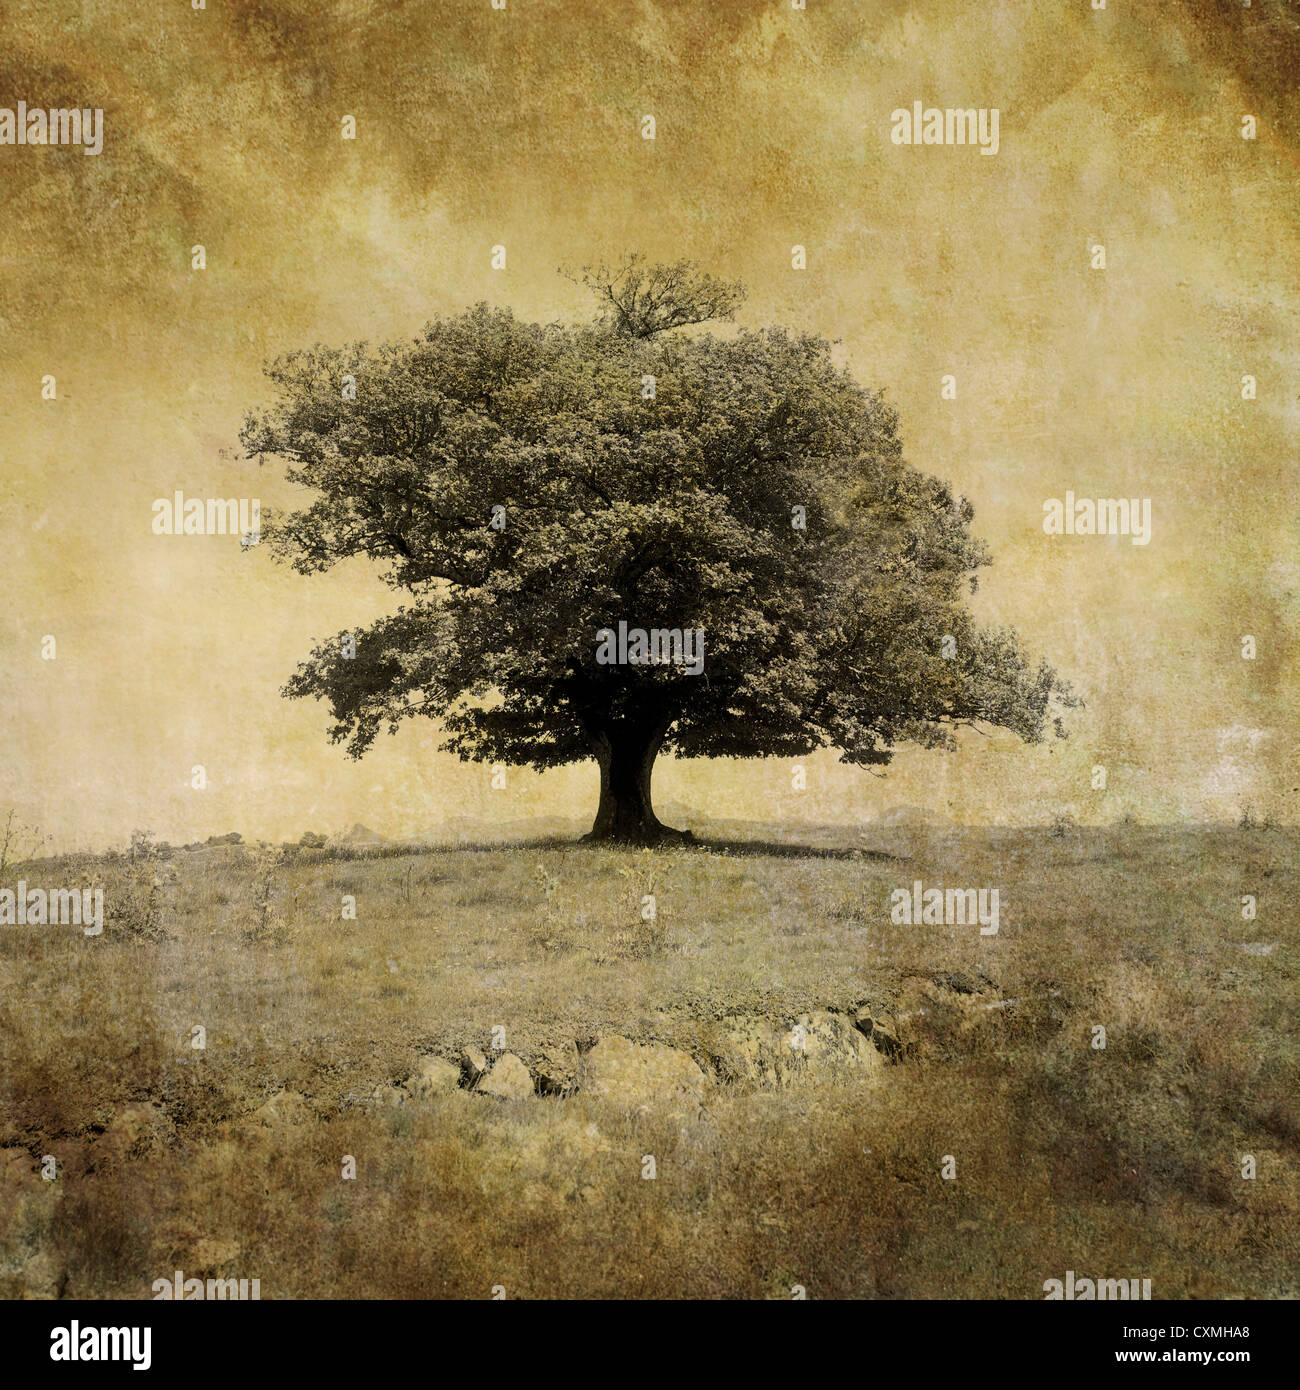 Oak Tree - vintage-look textured art effect image - Stock Image